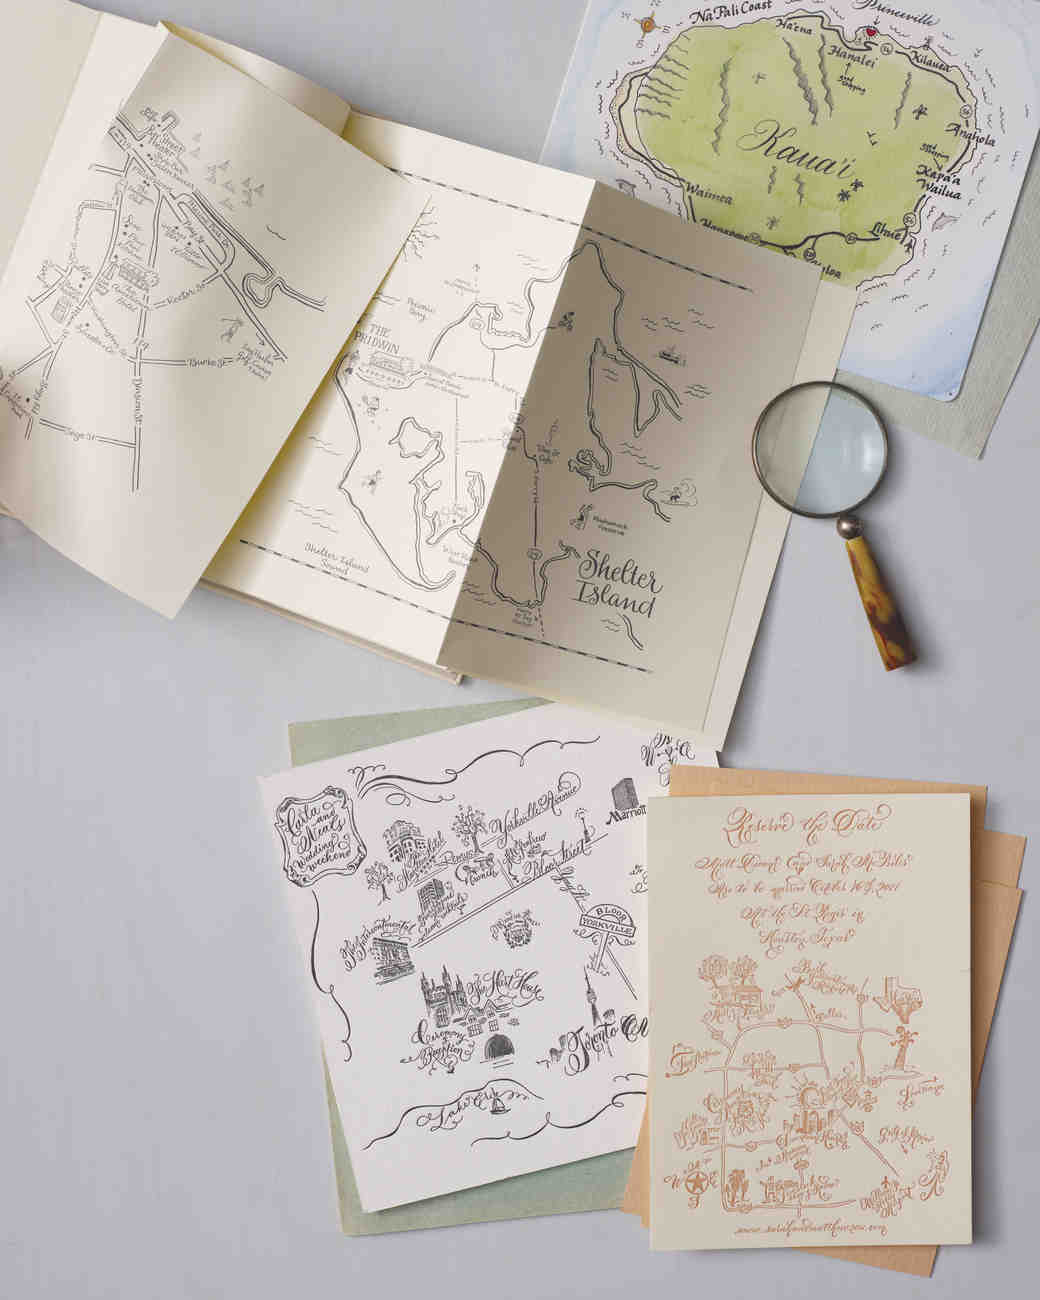 margo-me-martha-inspiration-map-calligraphy-sp11-0515.jpg